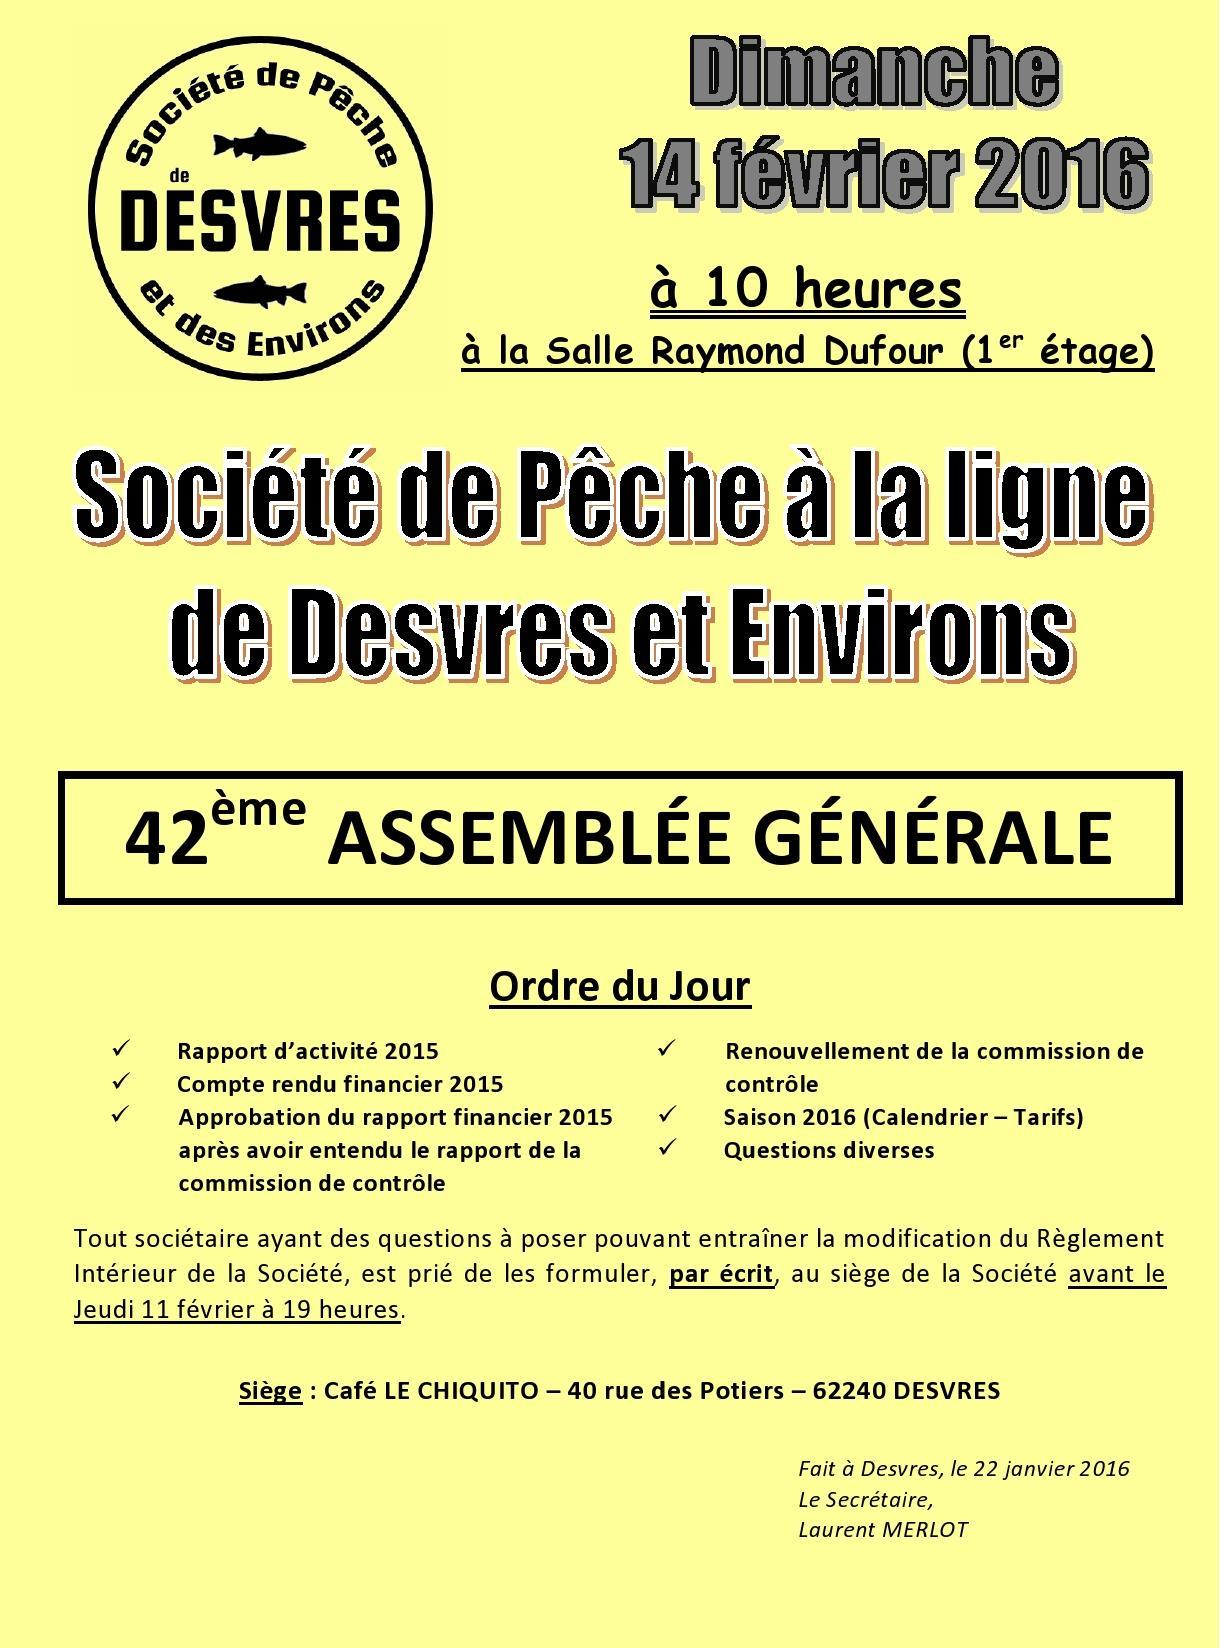 Affiche AG 14-02-2016 - jaune-page0001